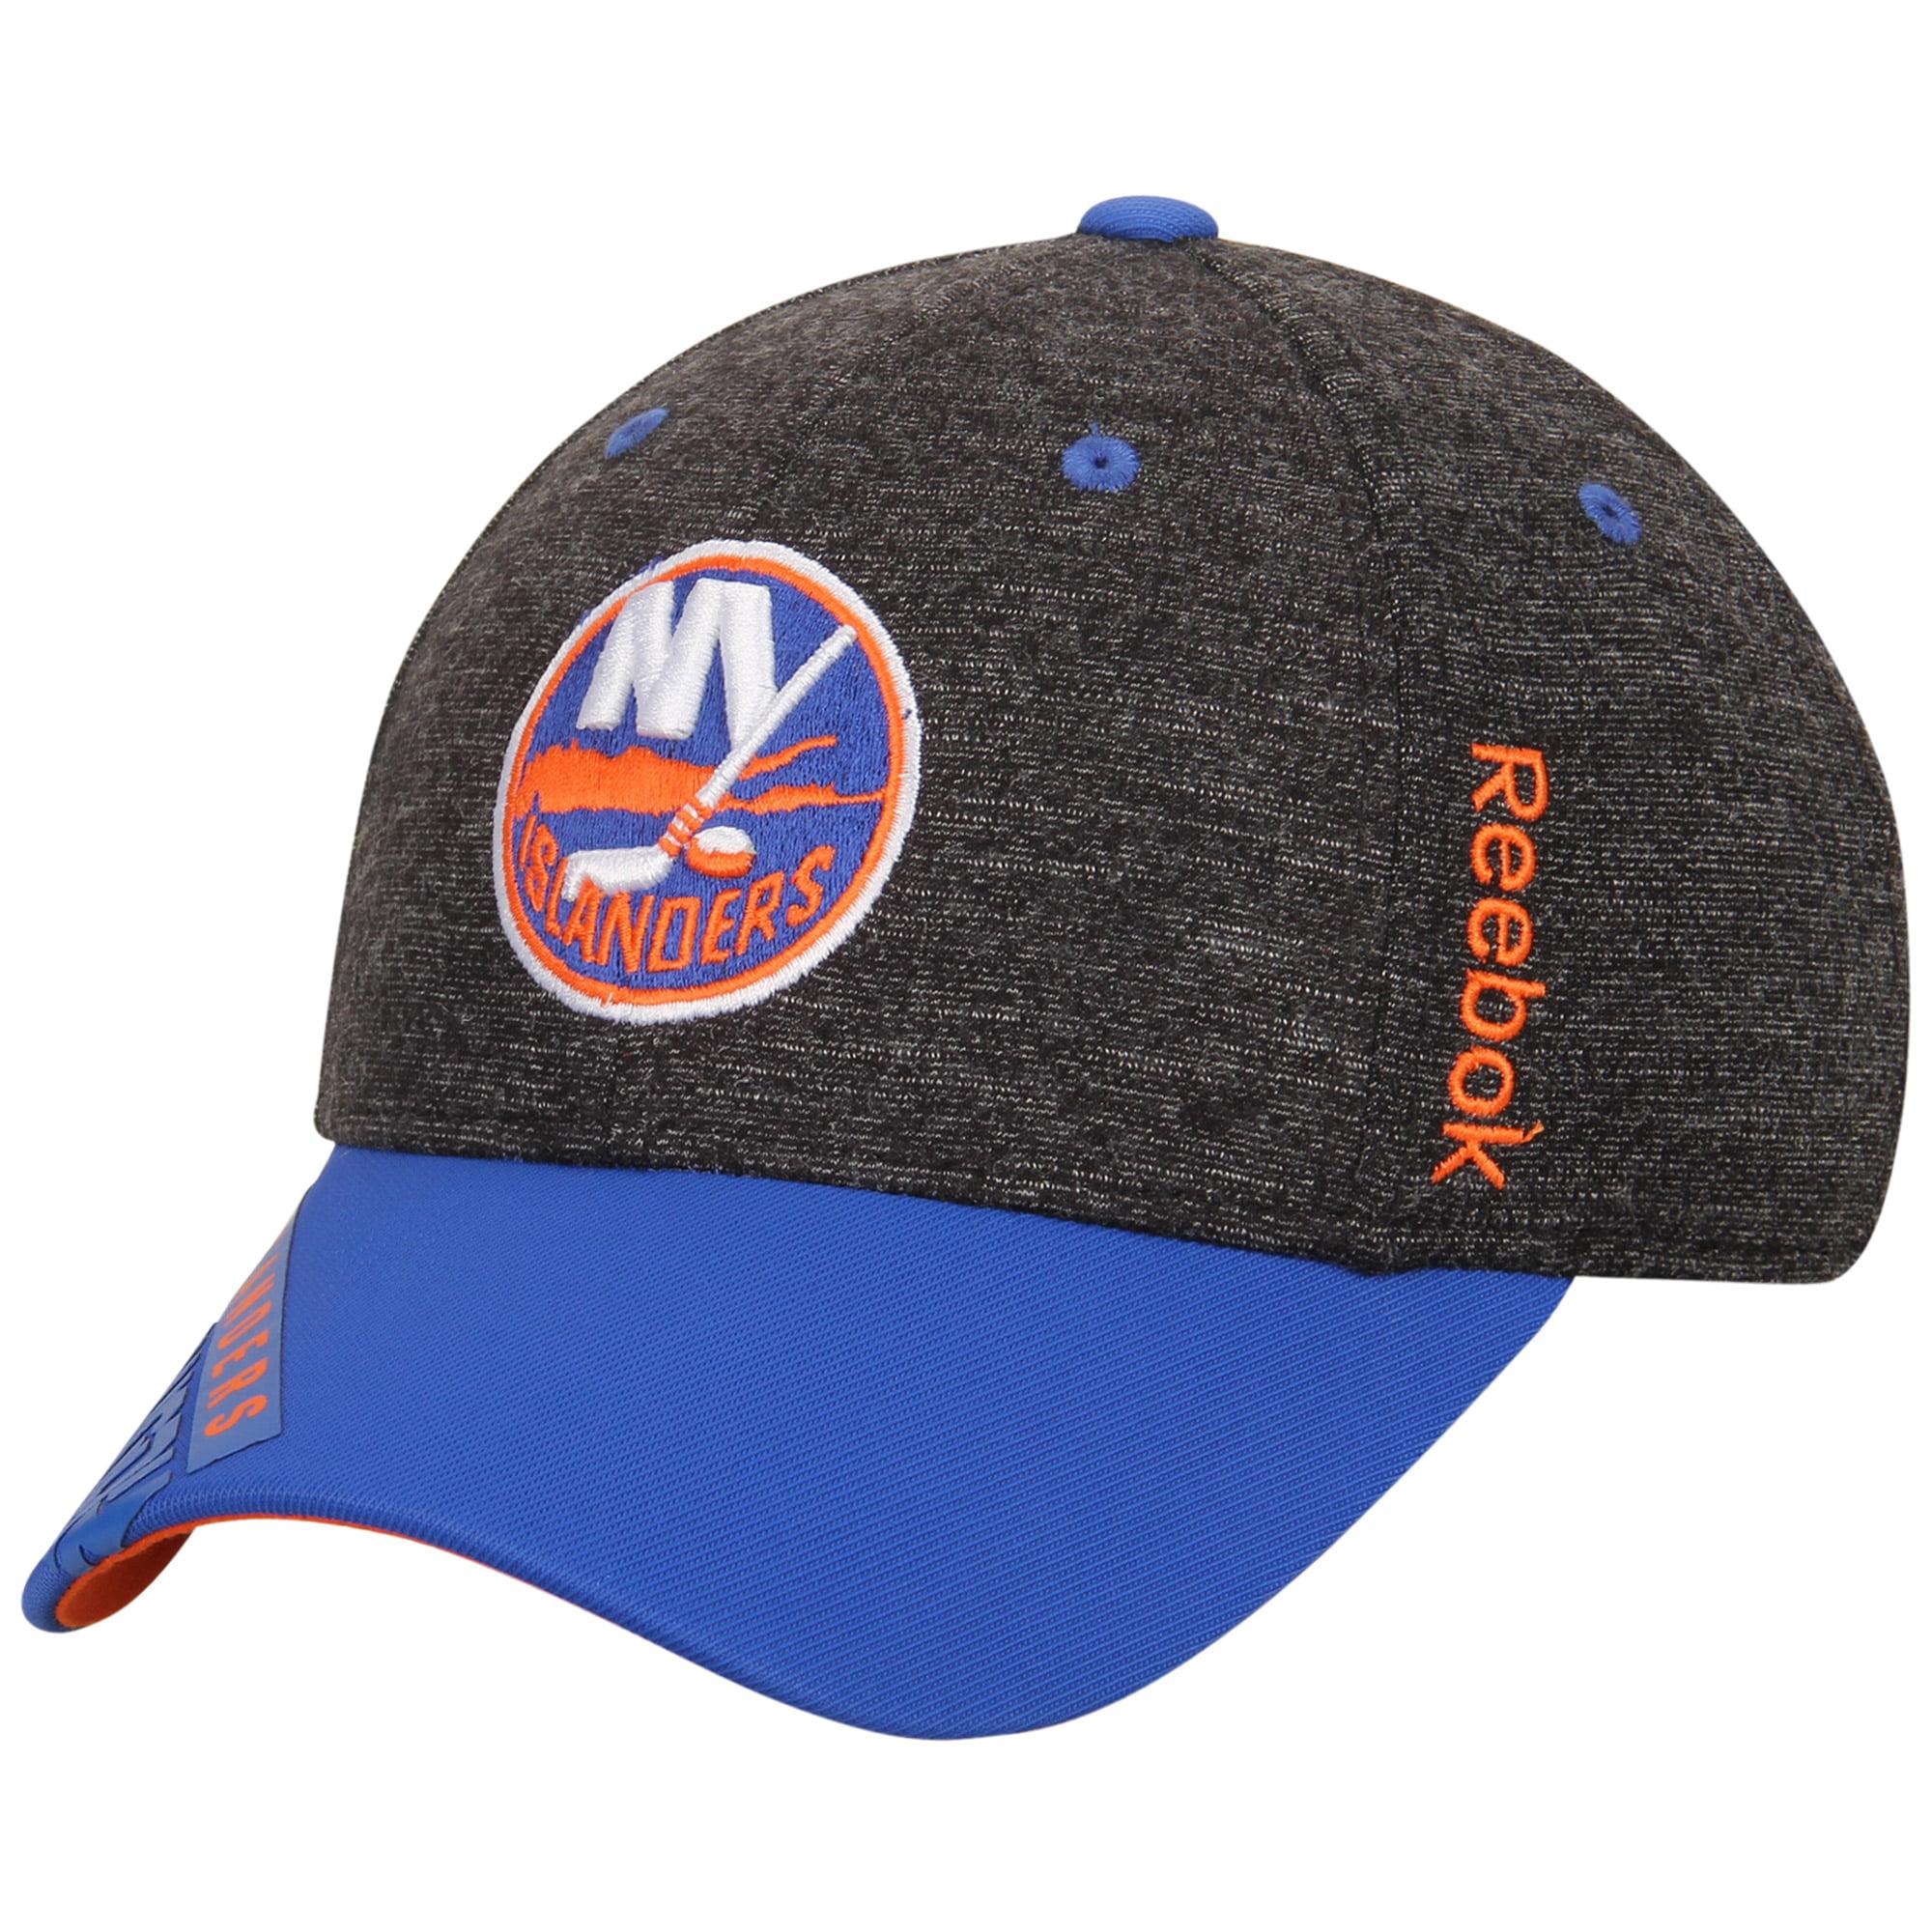 New York Islanders Reebok Youth Playoff Structured Flex Hat - Black - OSFA